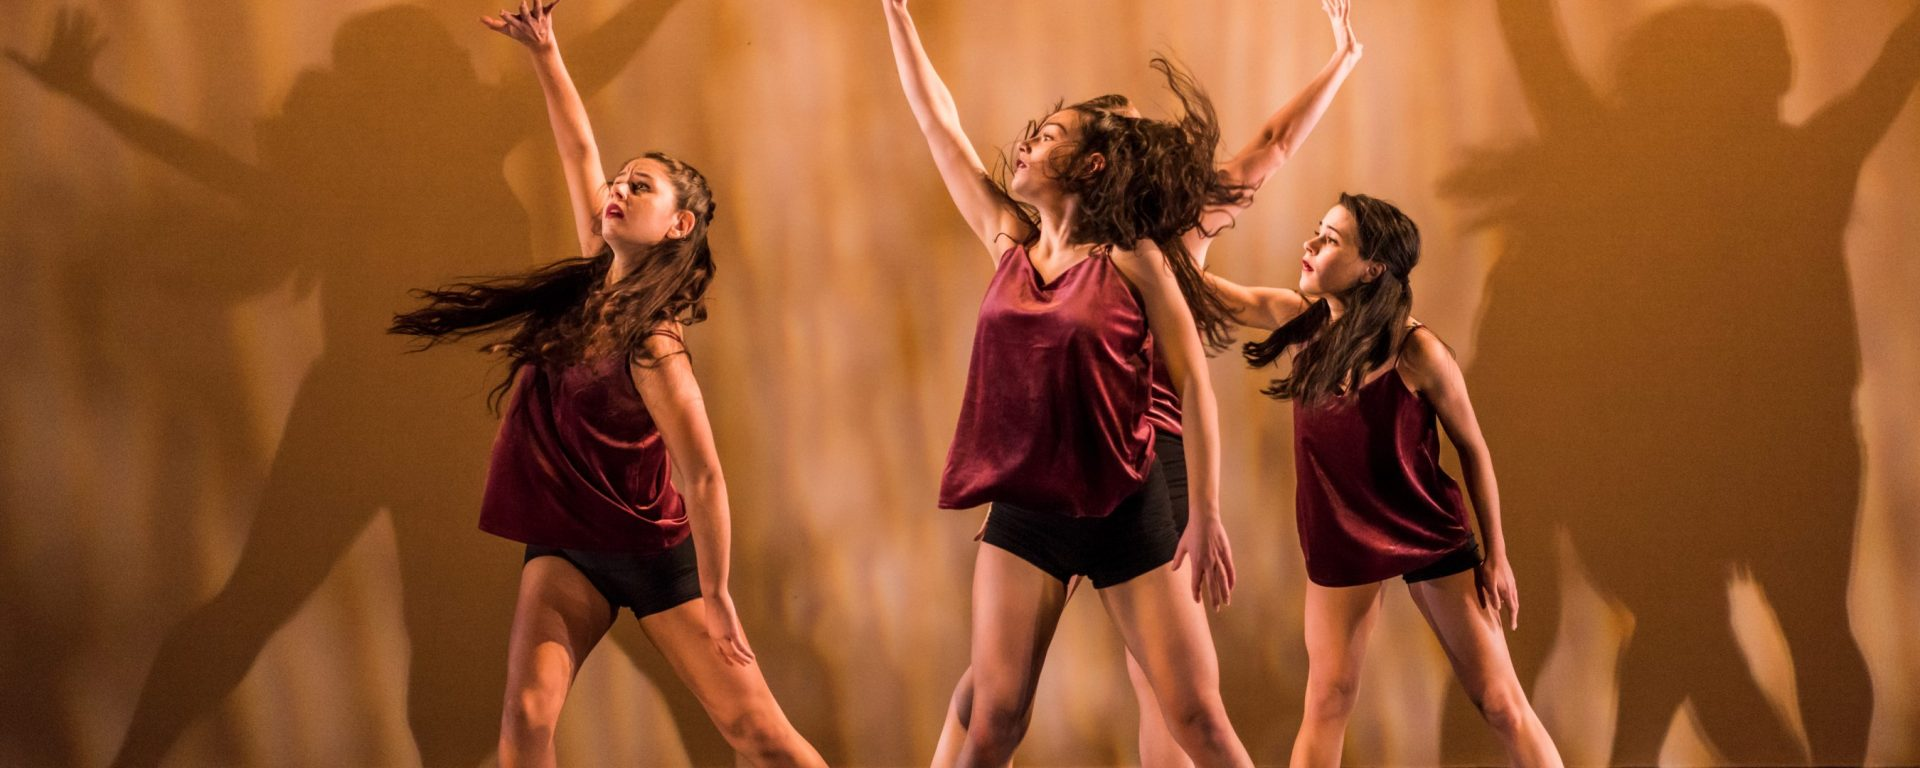 Petasis '19 at UMBC's fall Senior Dance Concert. Photo by Marlayna Demond '11.